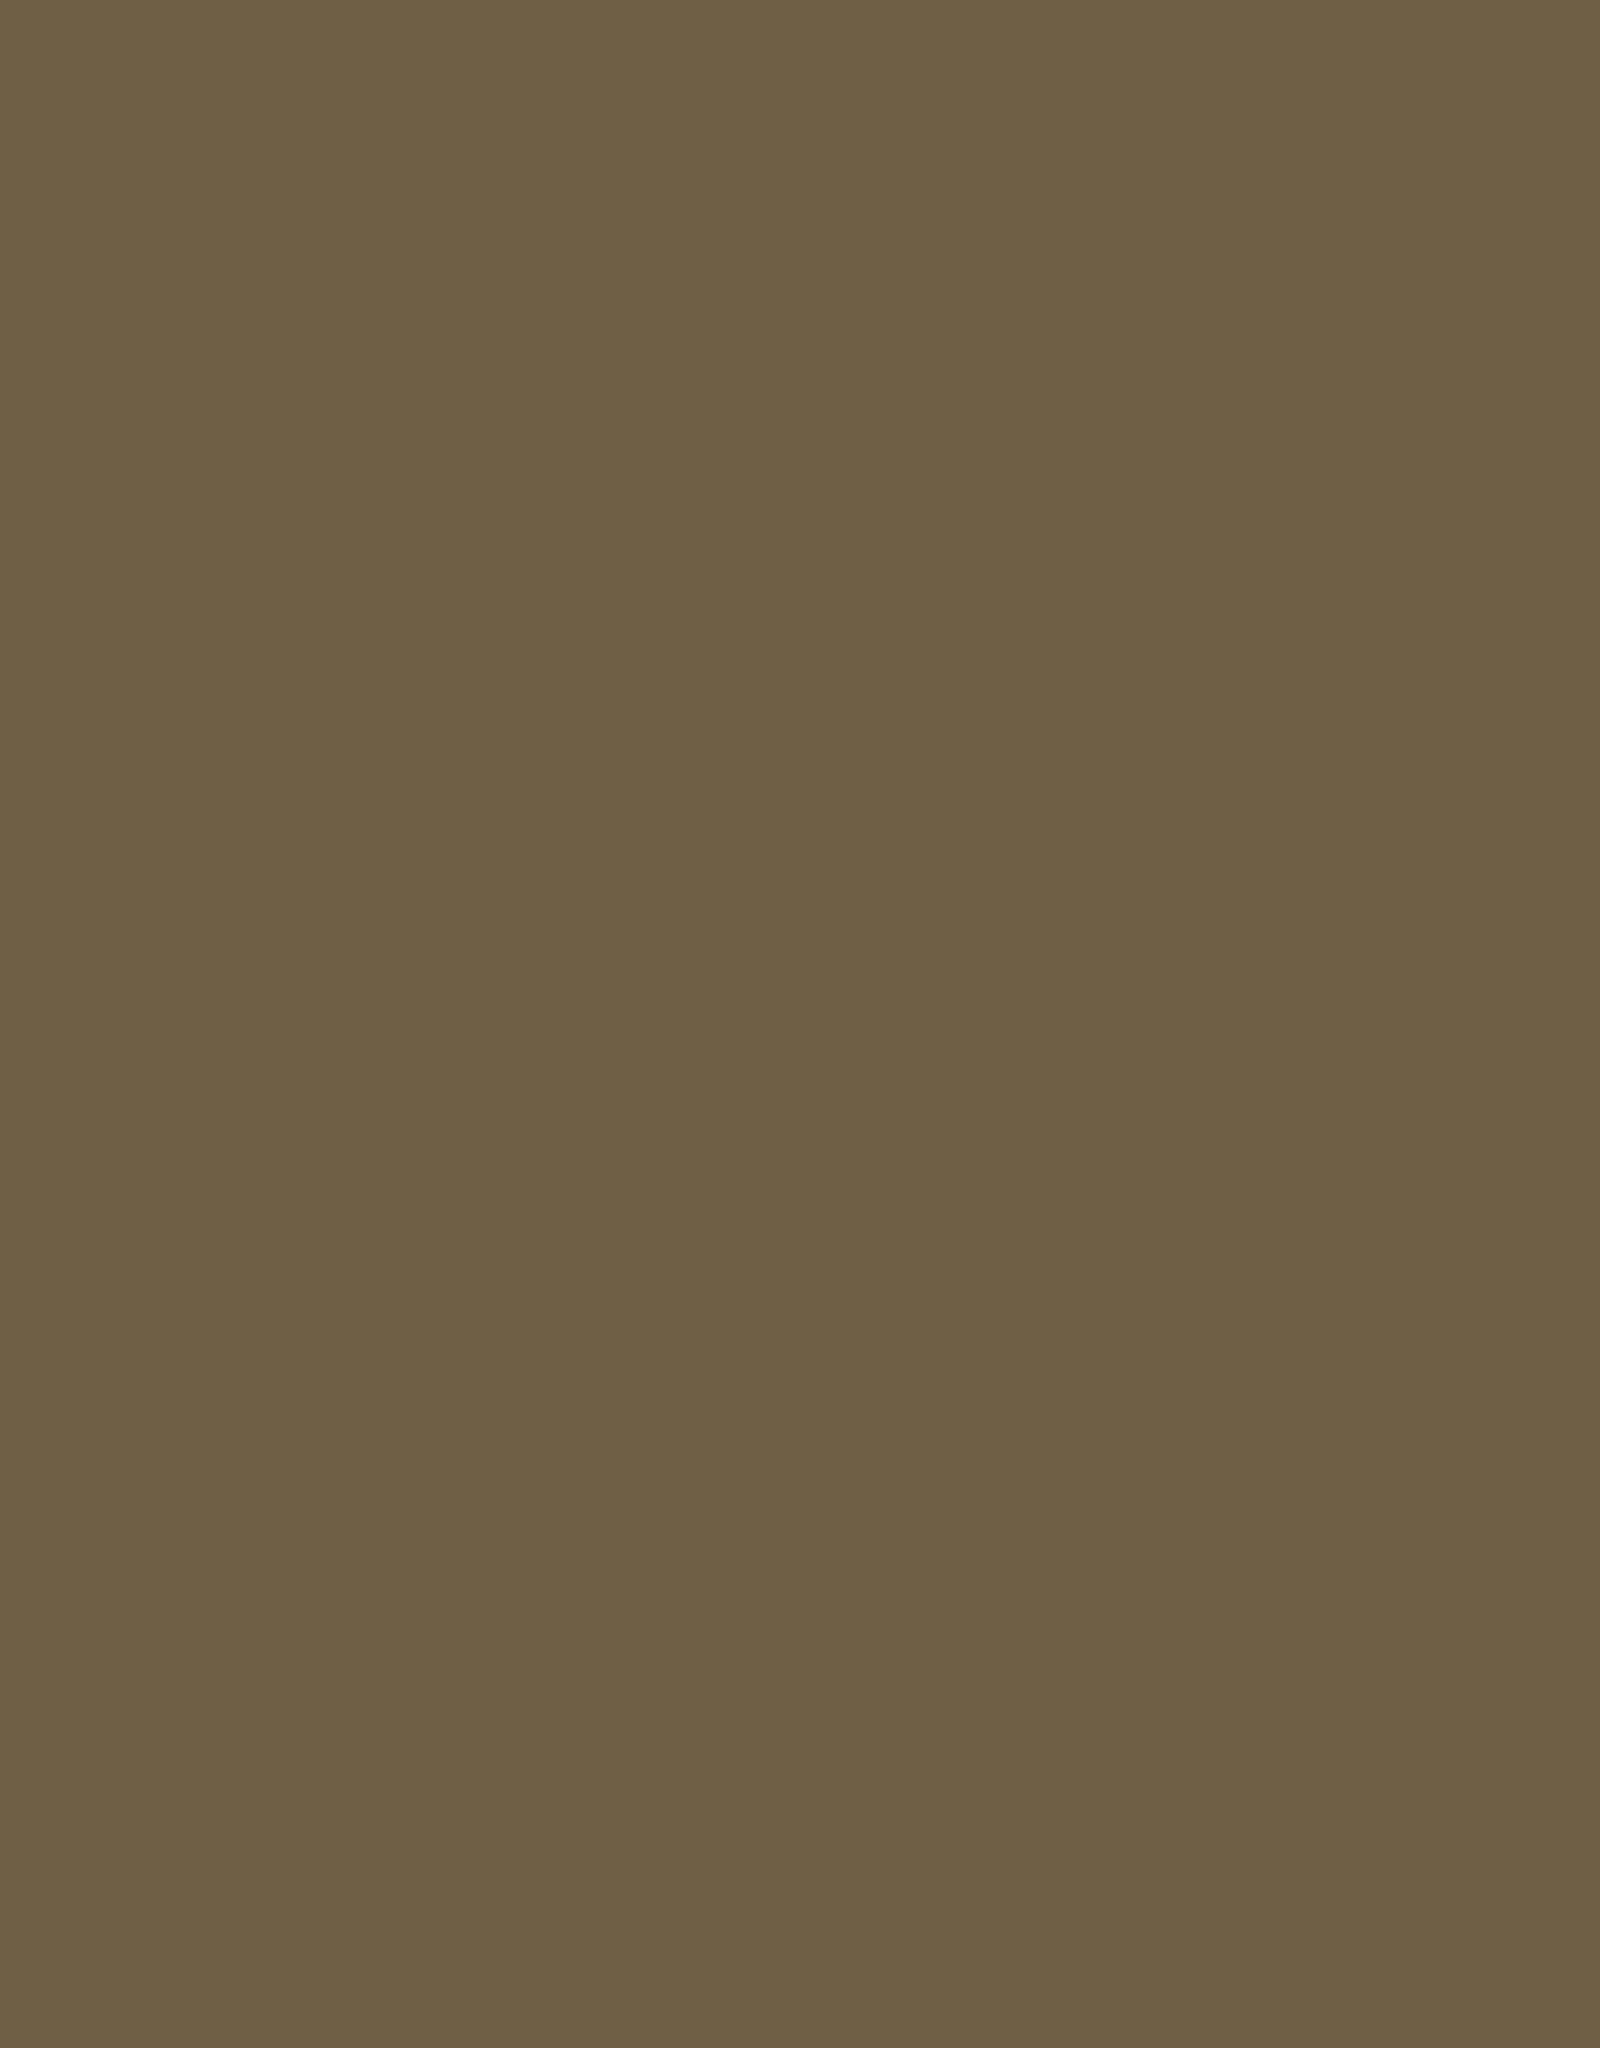 Sennelier, Extra Fine Soft Pastel, Olive Green